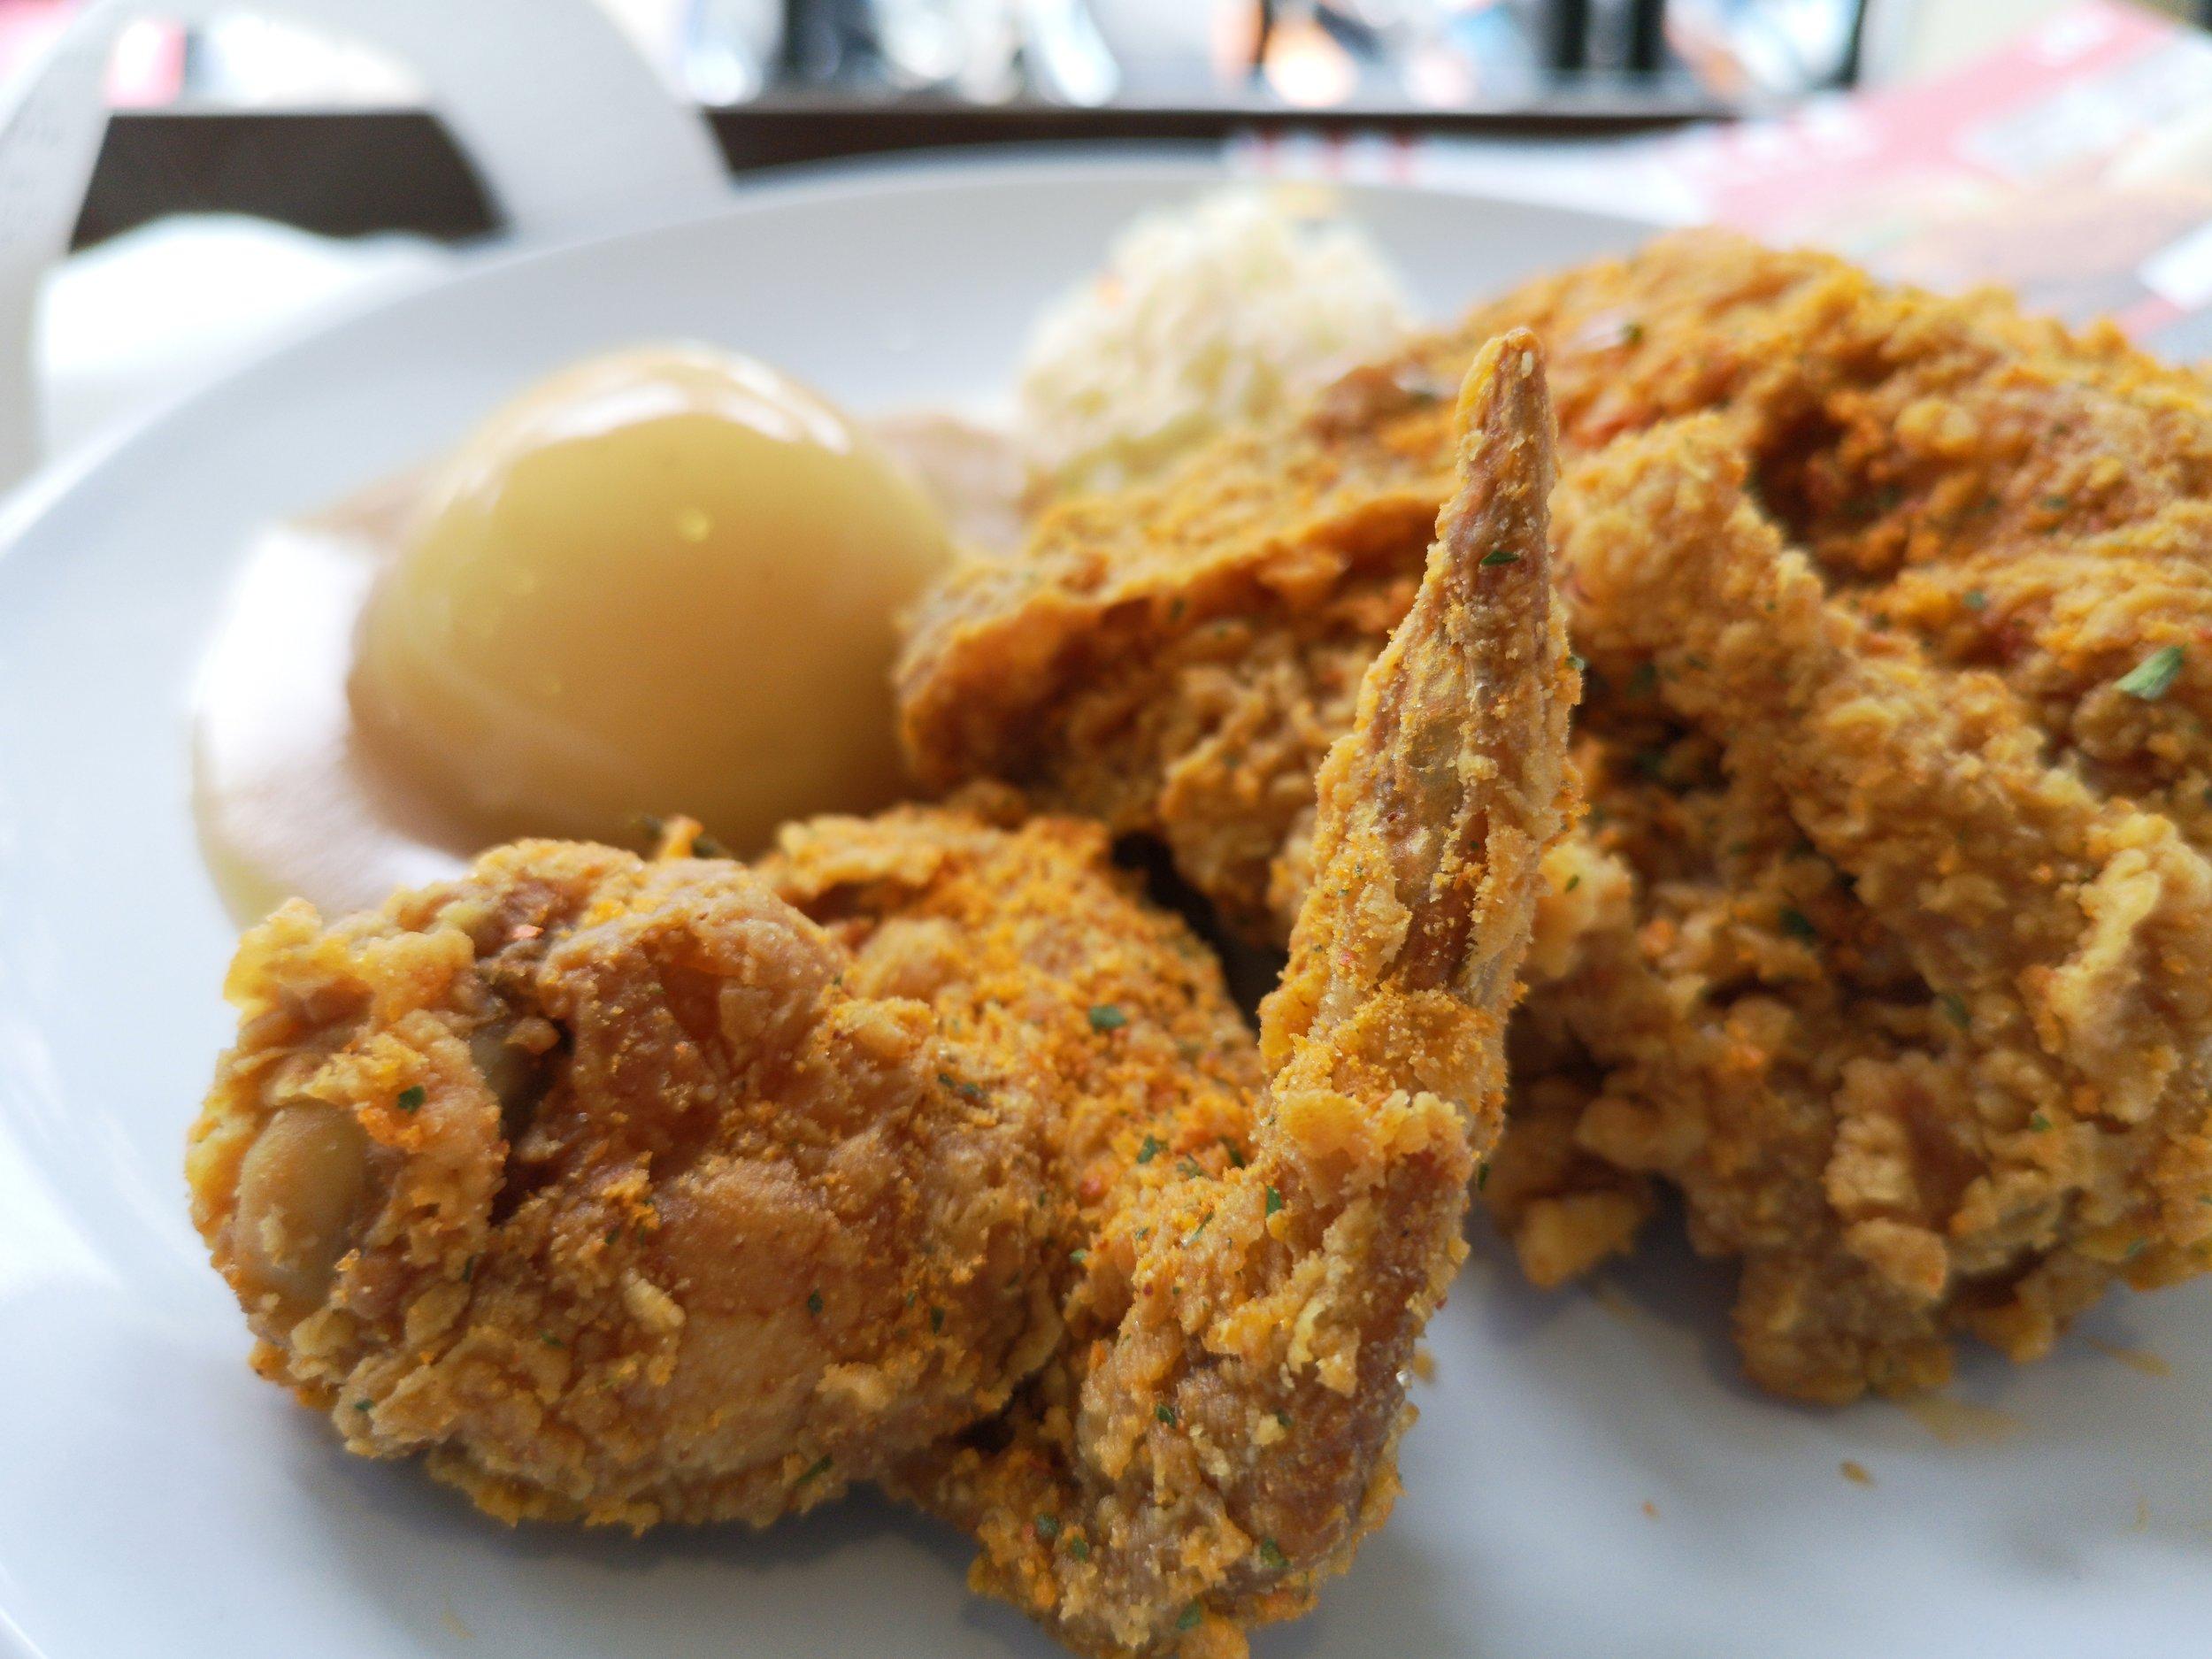 KFC Golden Egg Crunch Salted Egg Yolk 2019